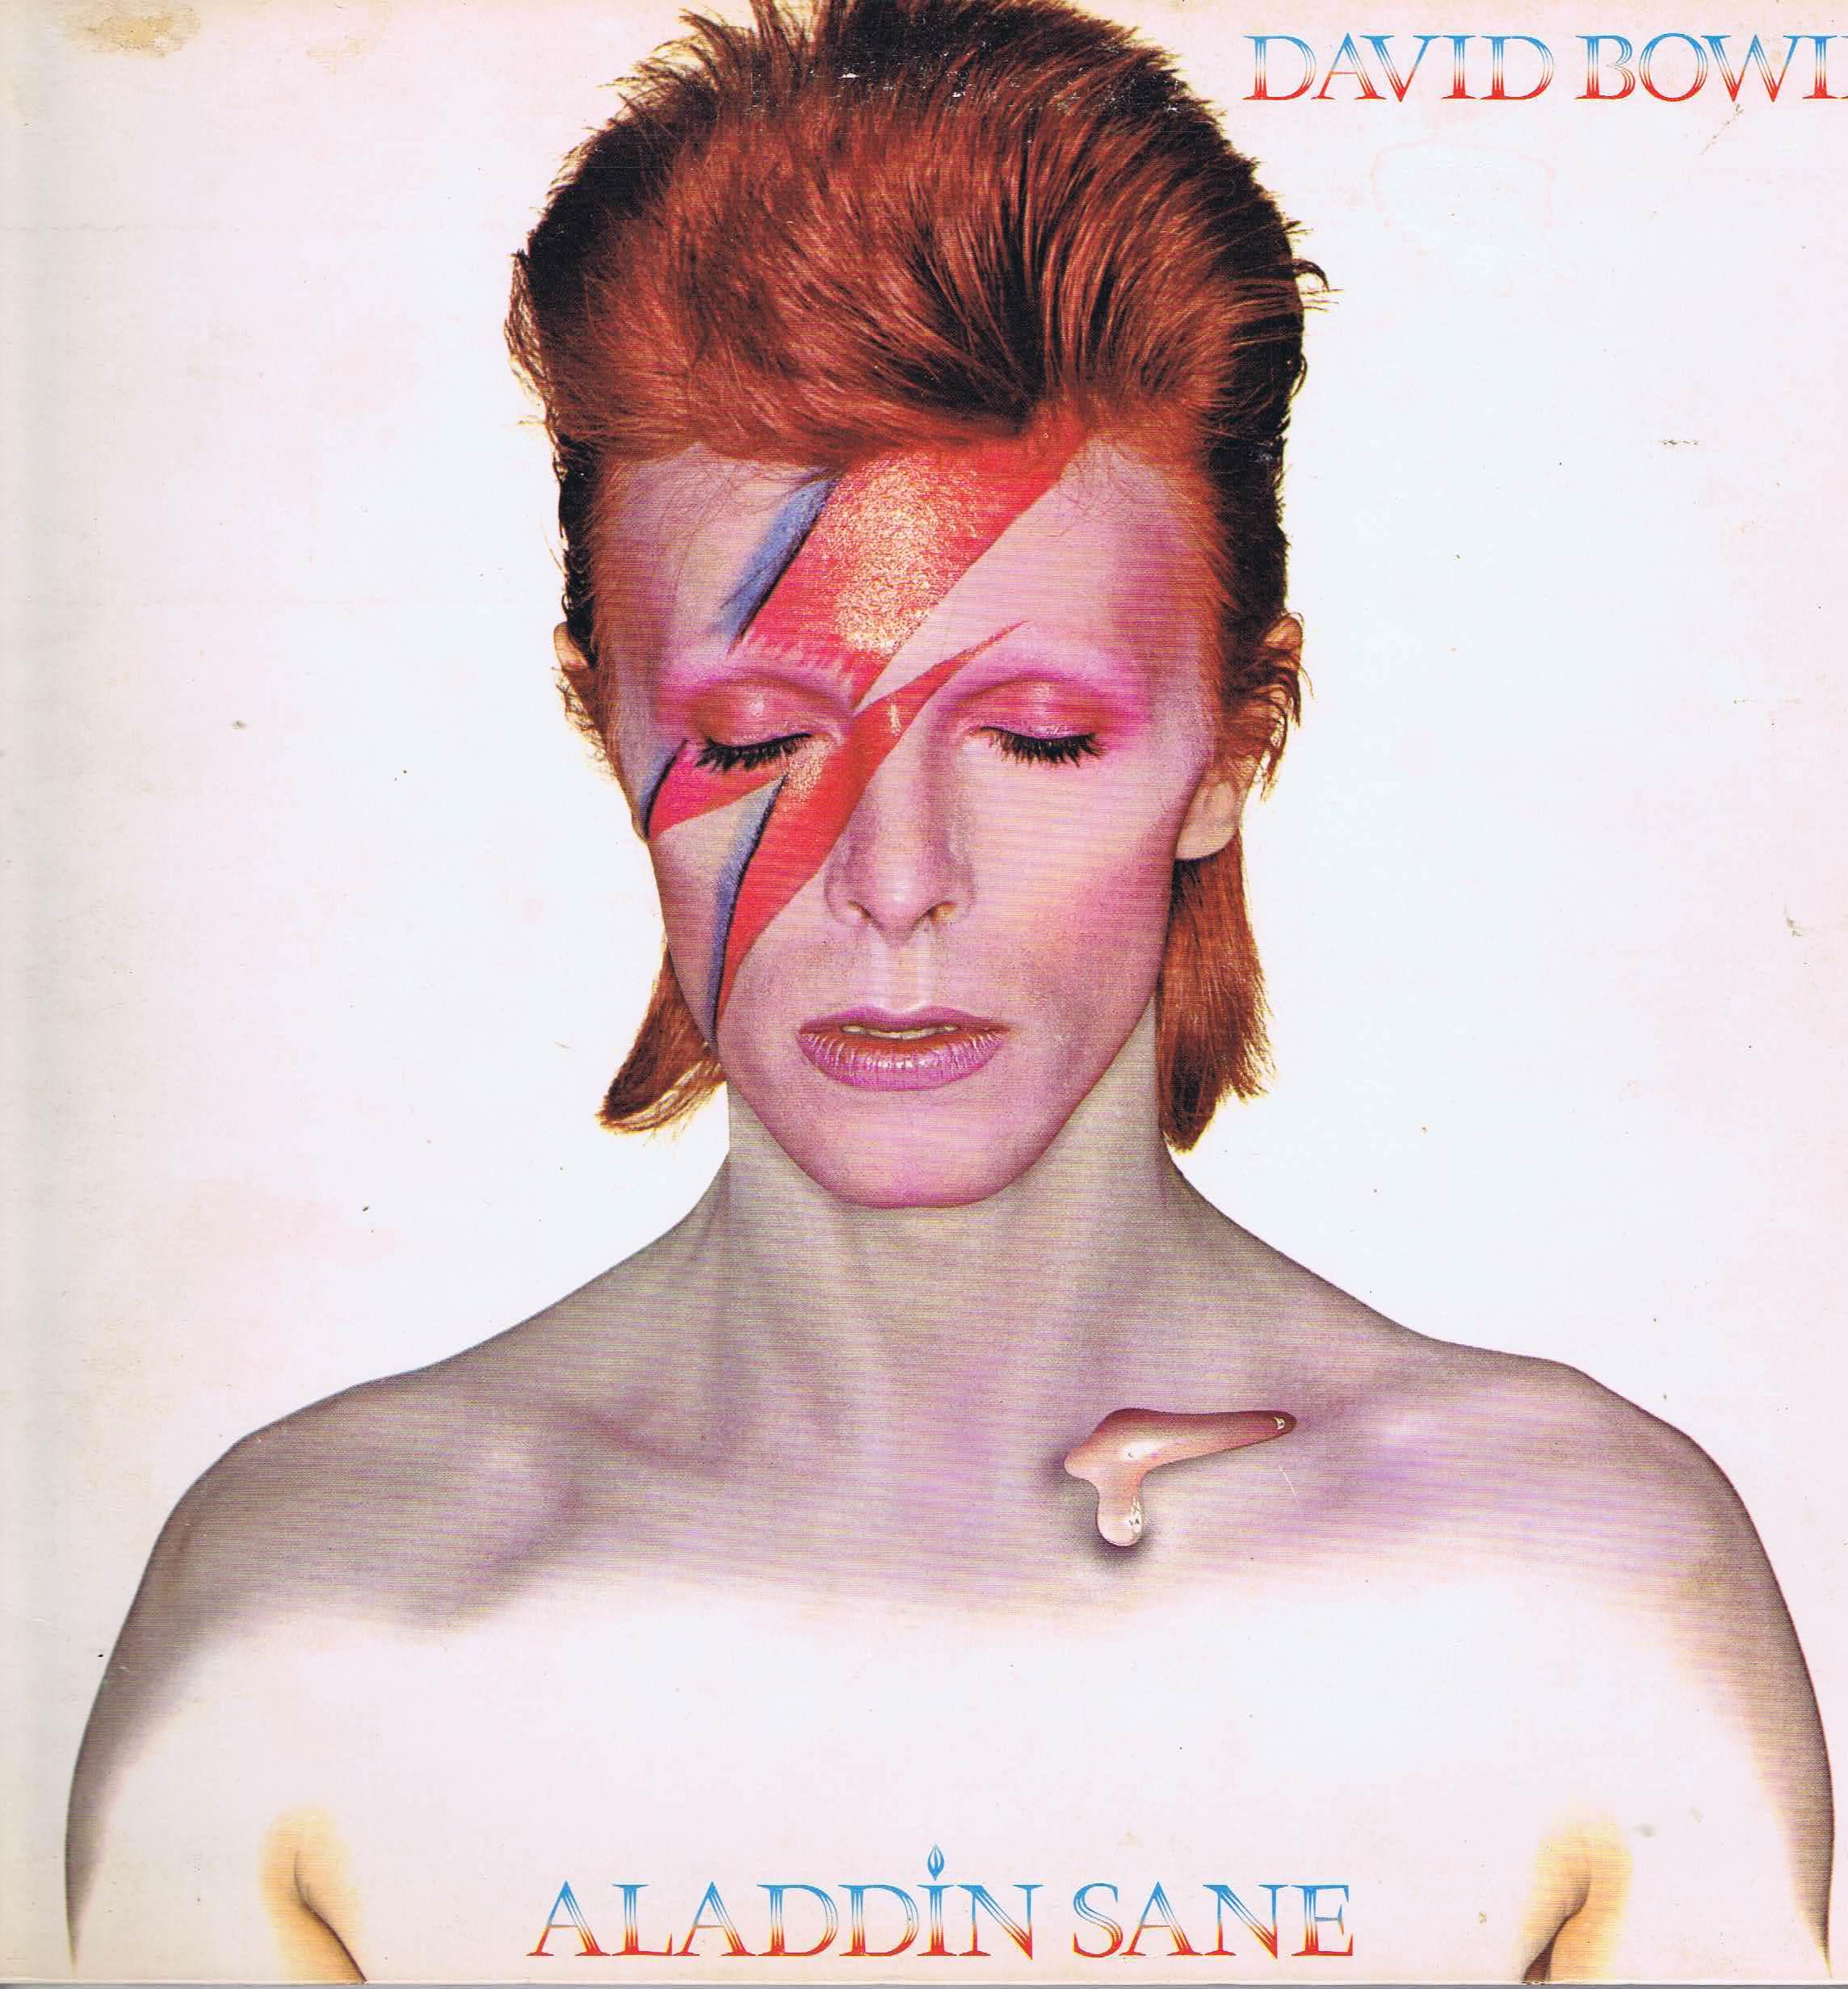 David Bowie – Aladdin Sane – CPRS-4543